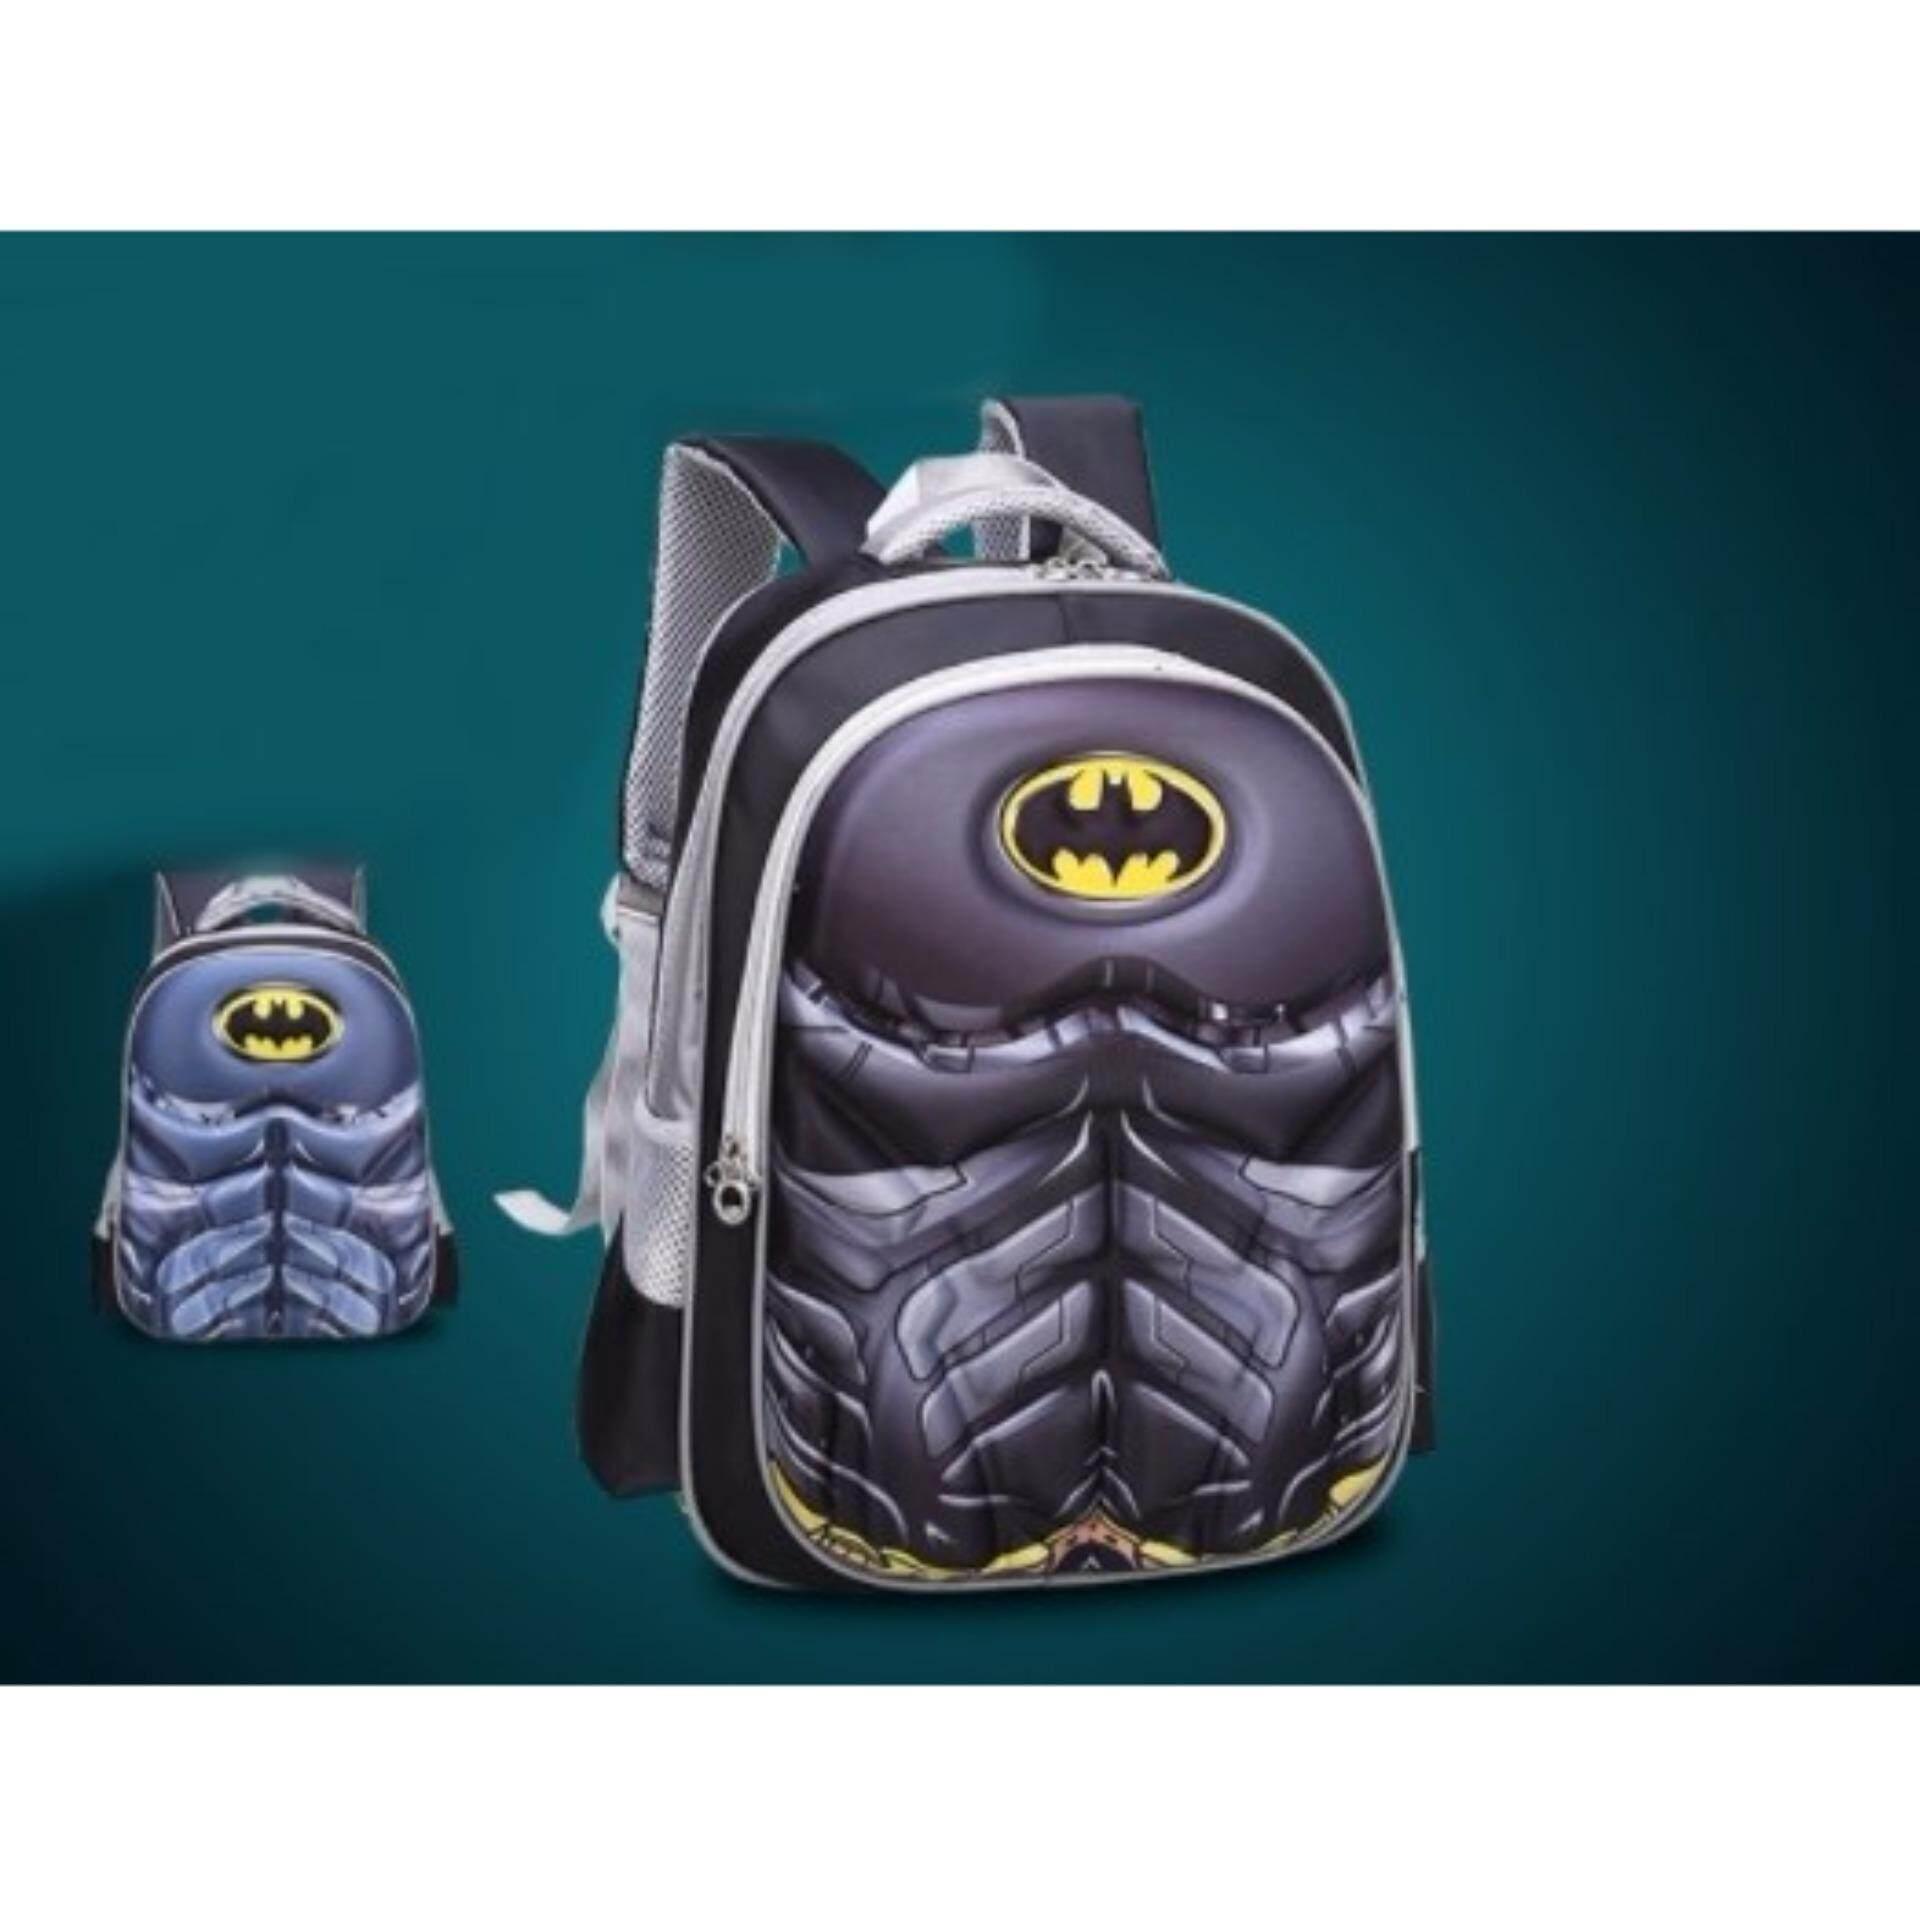 Fashion Schoolbag Backpack For Kids Marvel Hero Bag 3D Printing Bag For Children School Bags